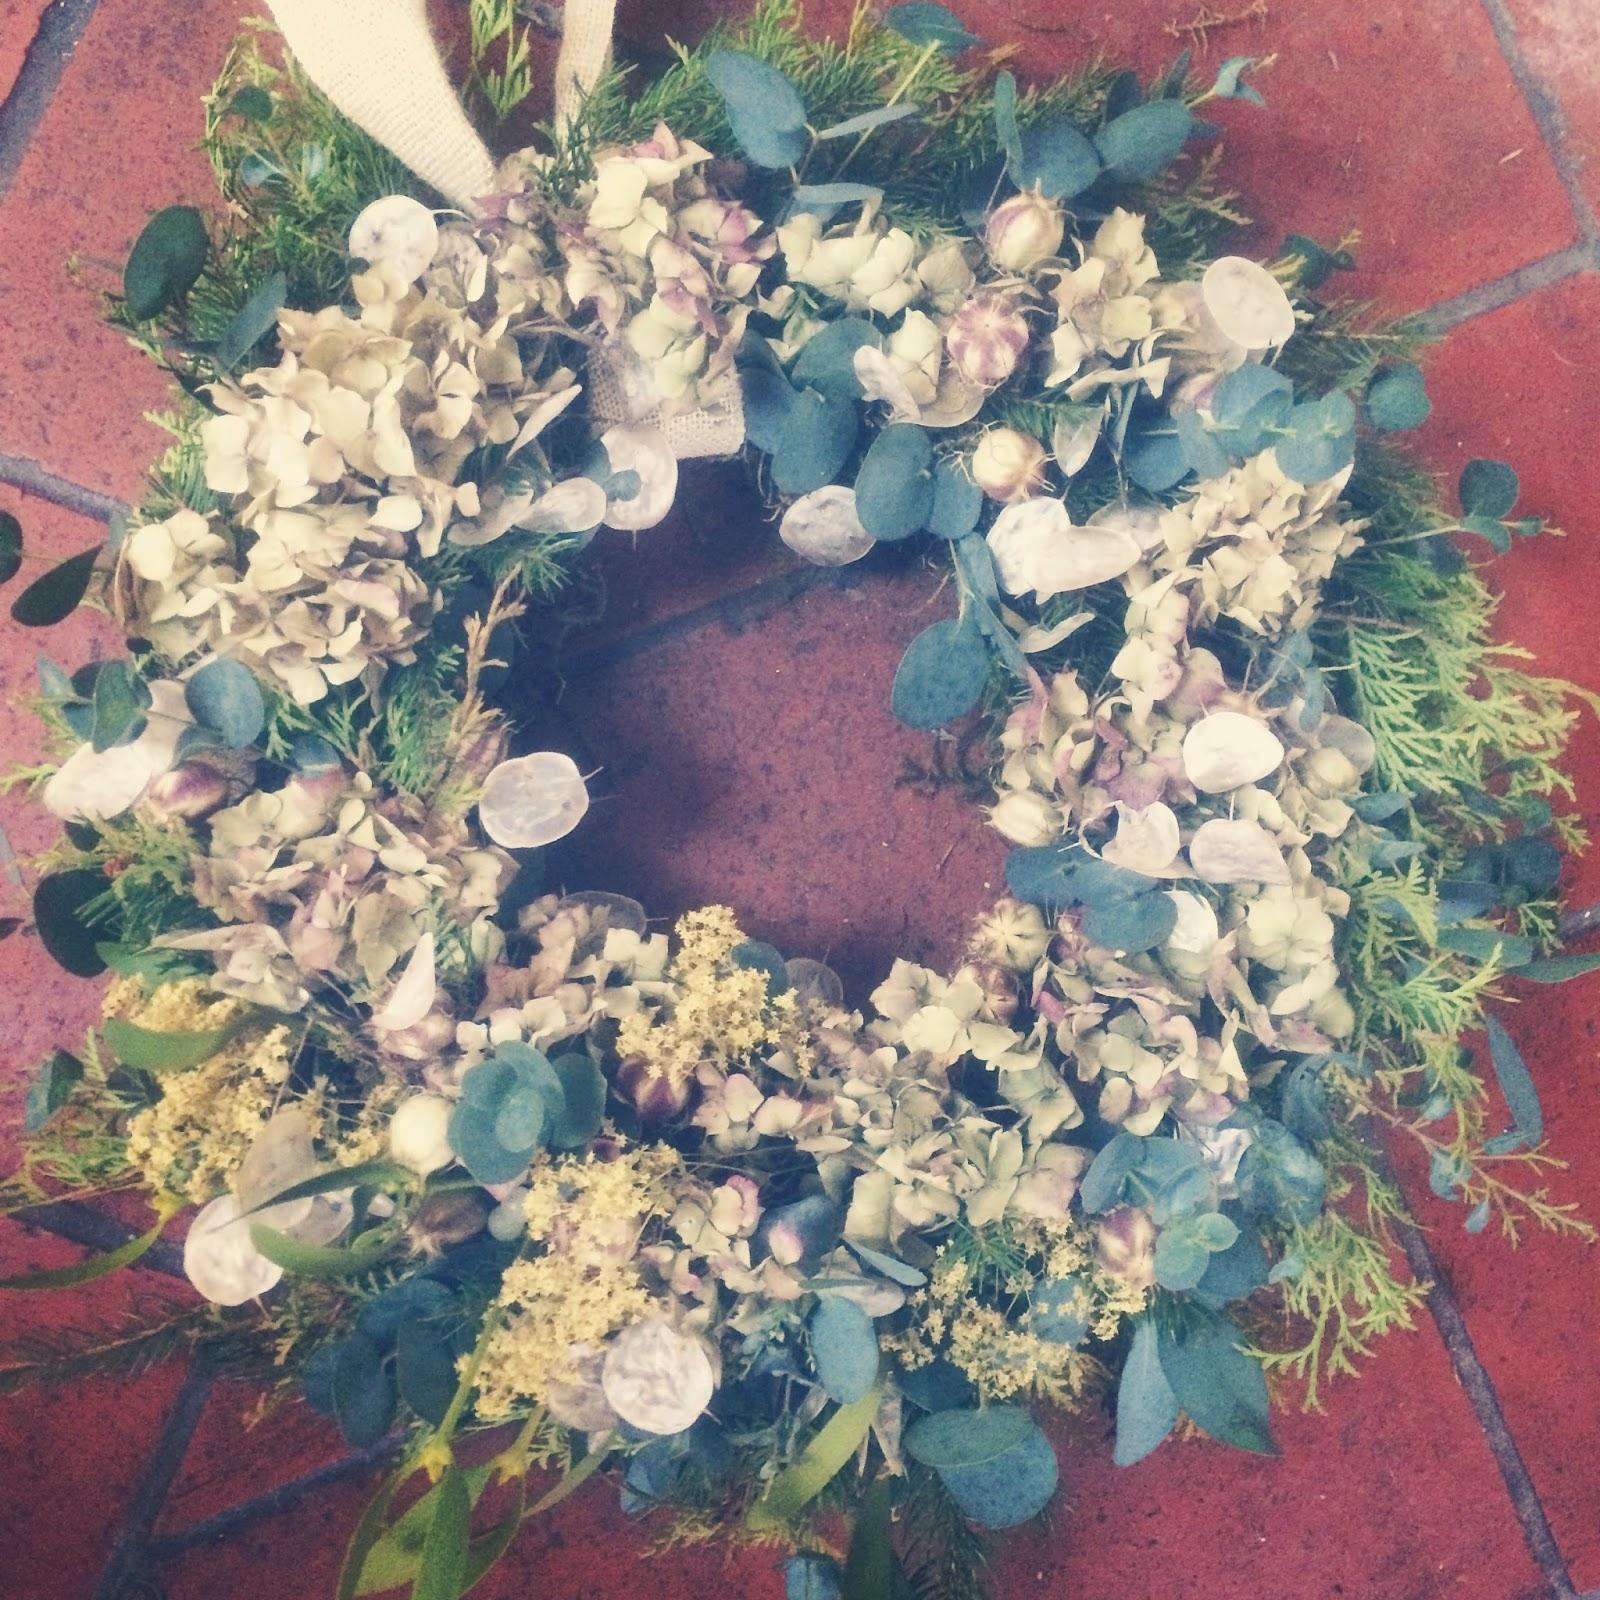 Fresh handmade wreath, Tuckshop Flowers, Birmingham